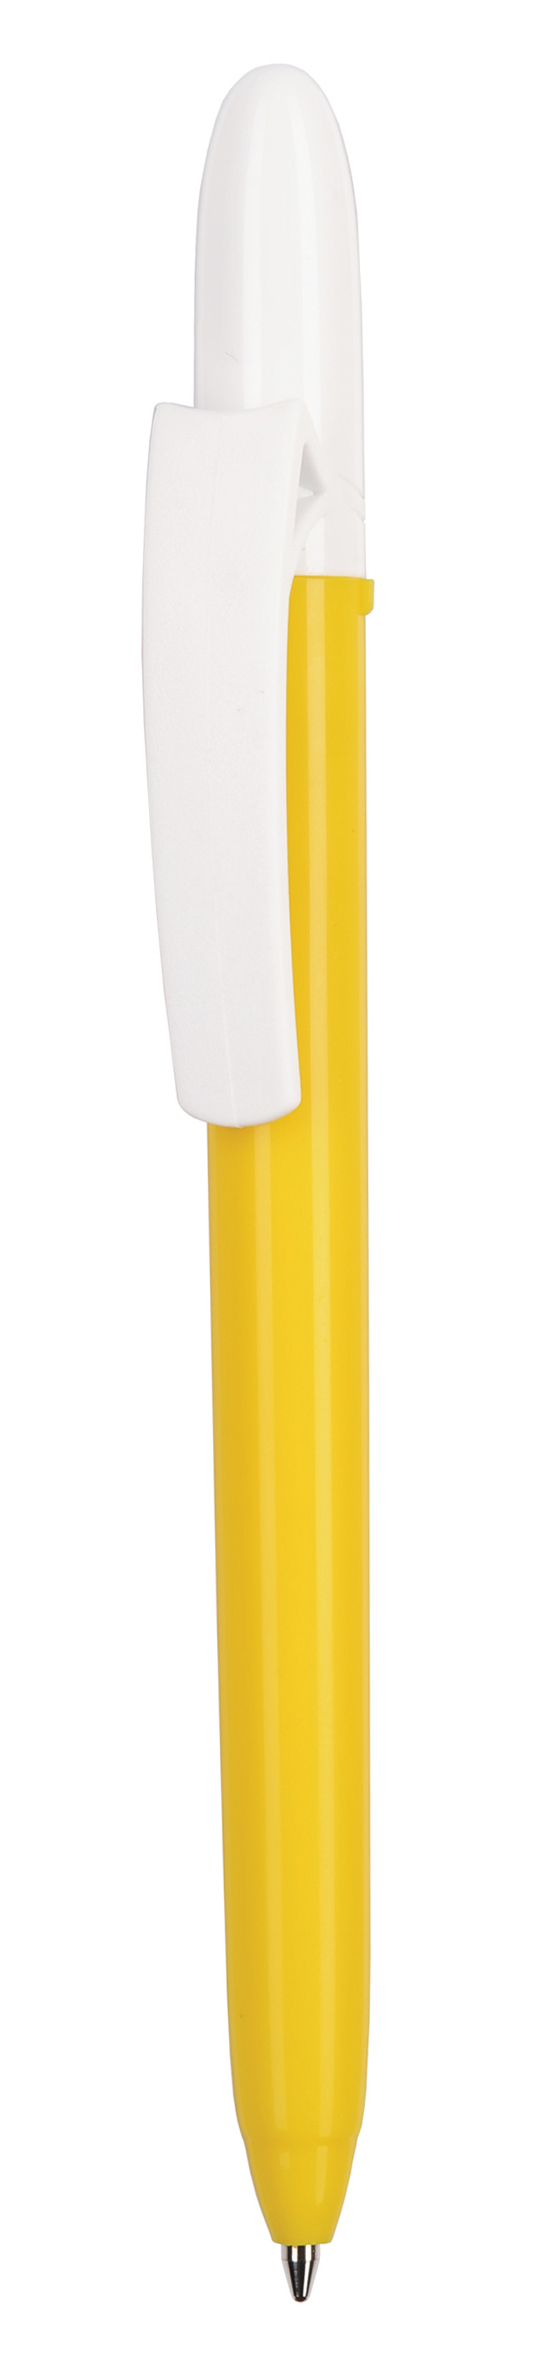 FILL_CLASSIC_yellow